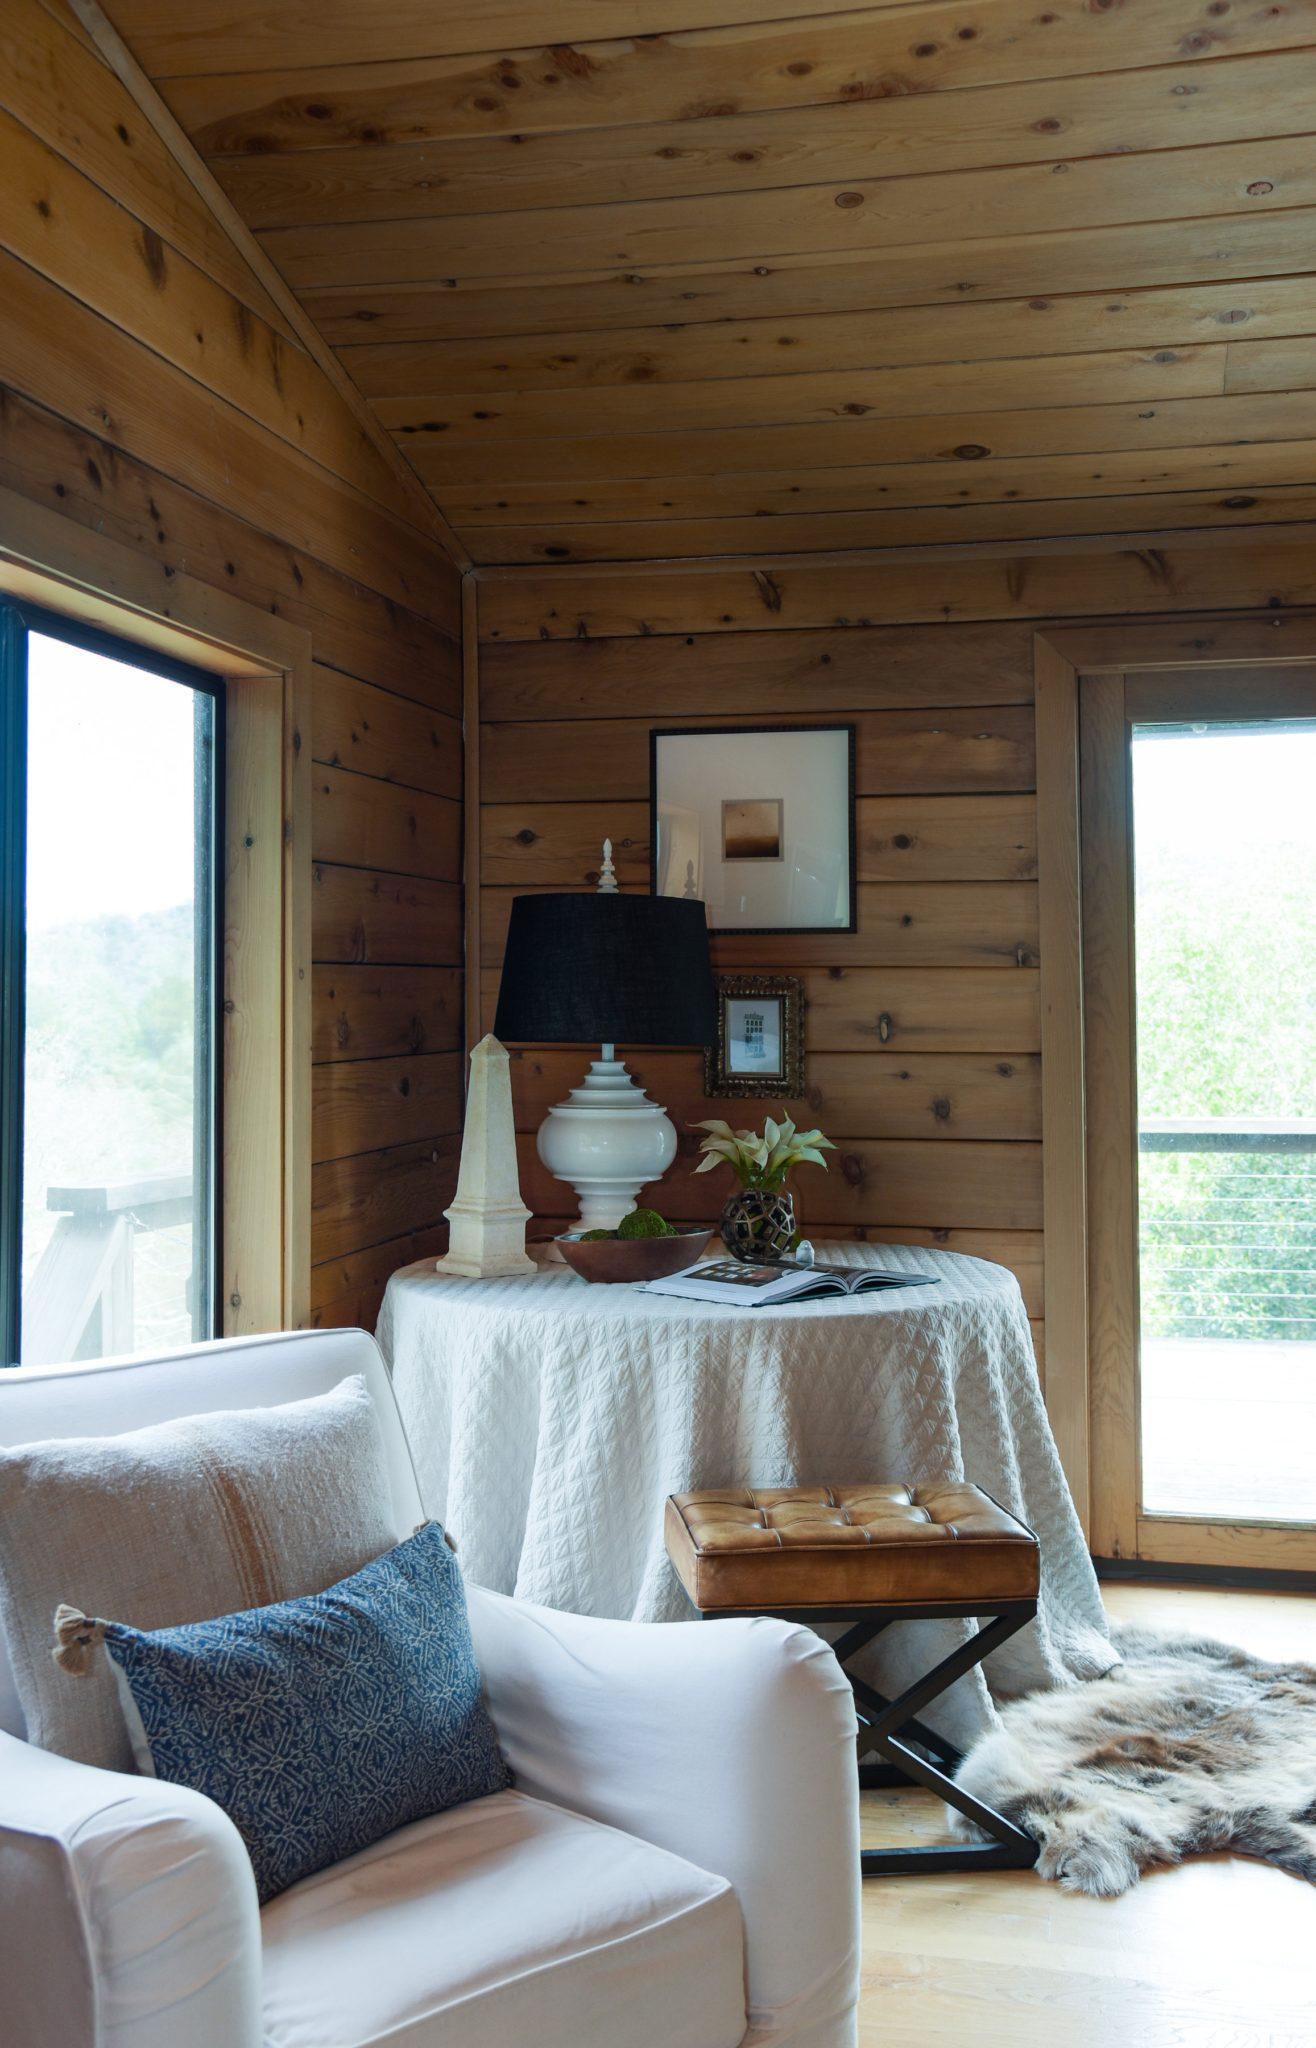 Napa cabin wood ceiling floor walls by Miyuki Yamaguchi Design Studio